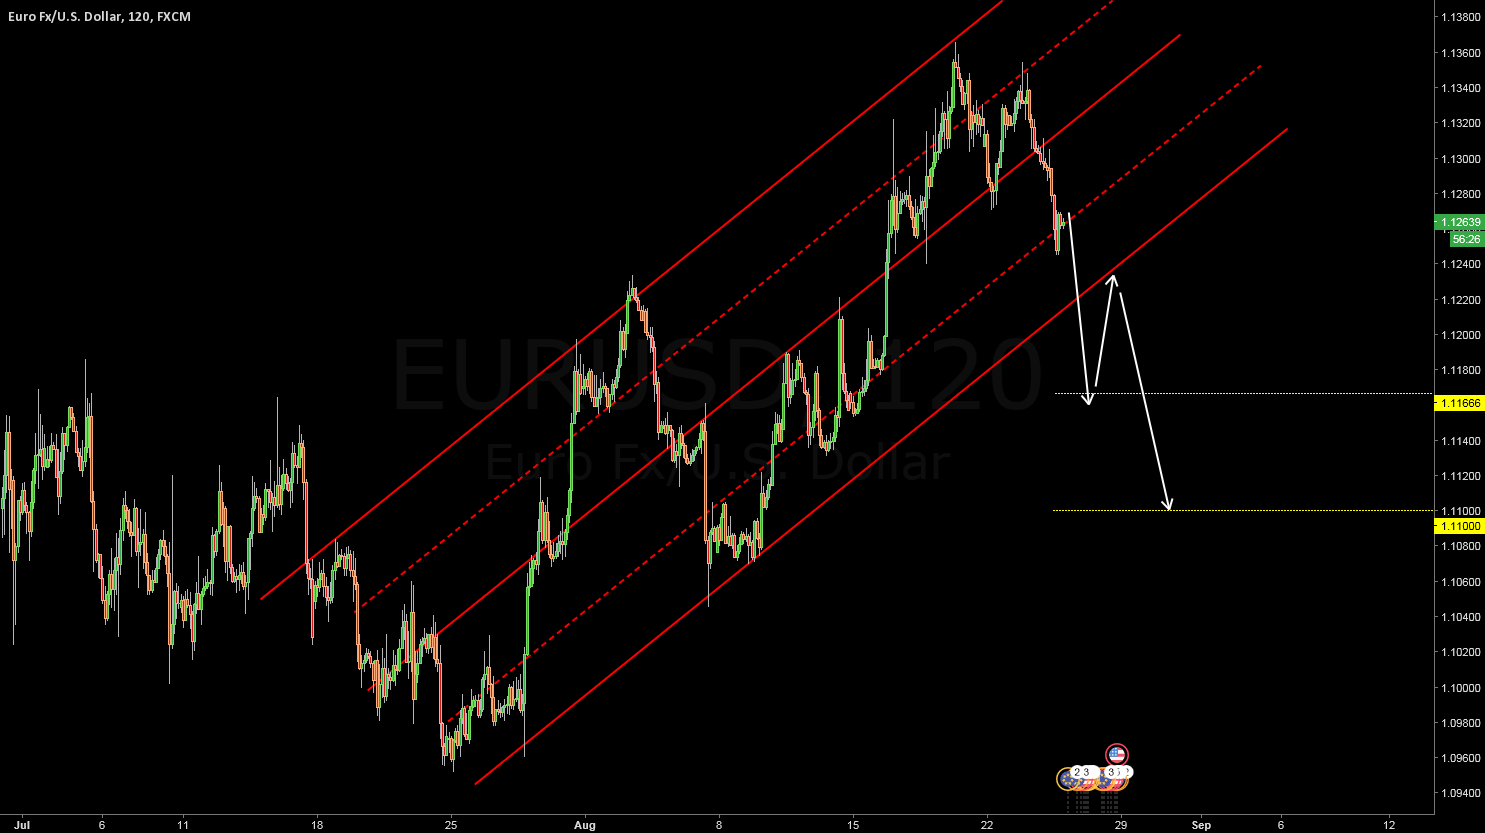 EURUSD - THE NEXT STEP